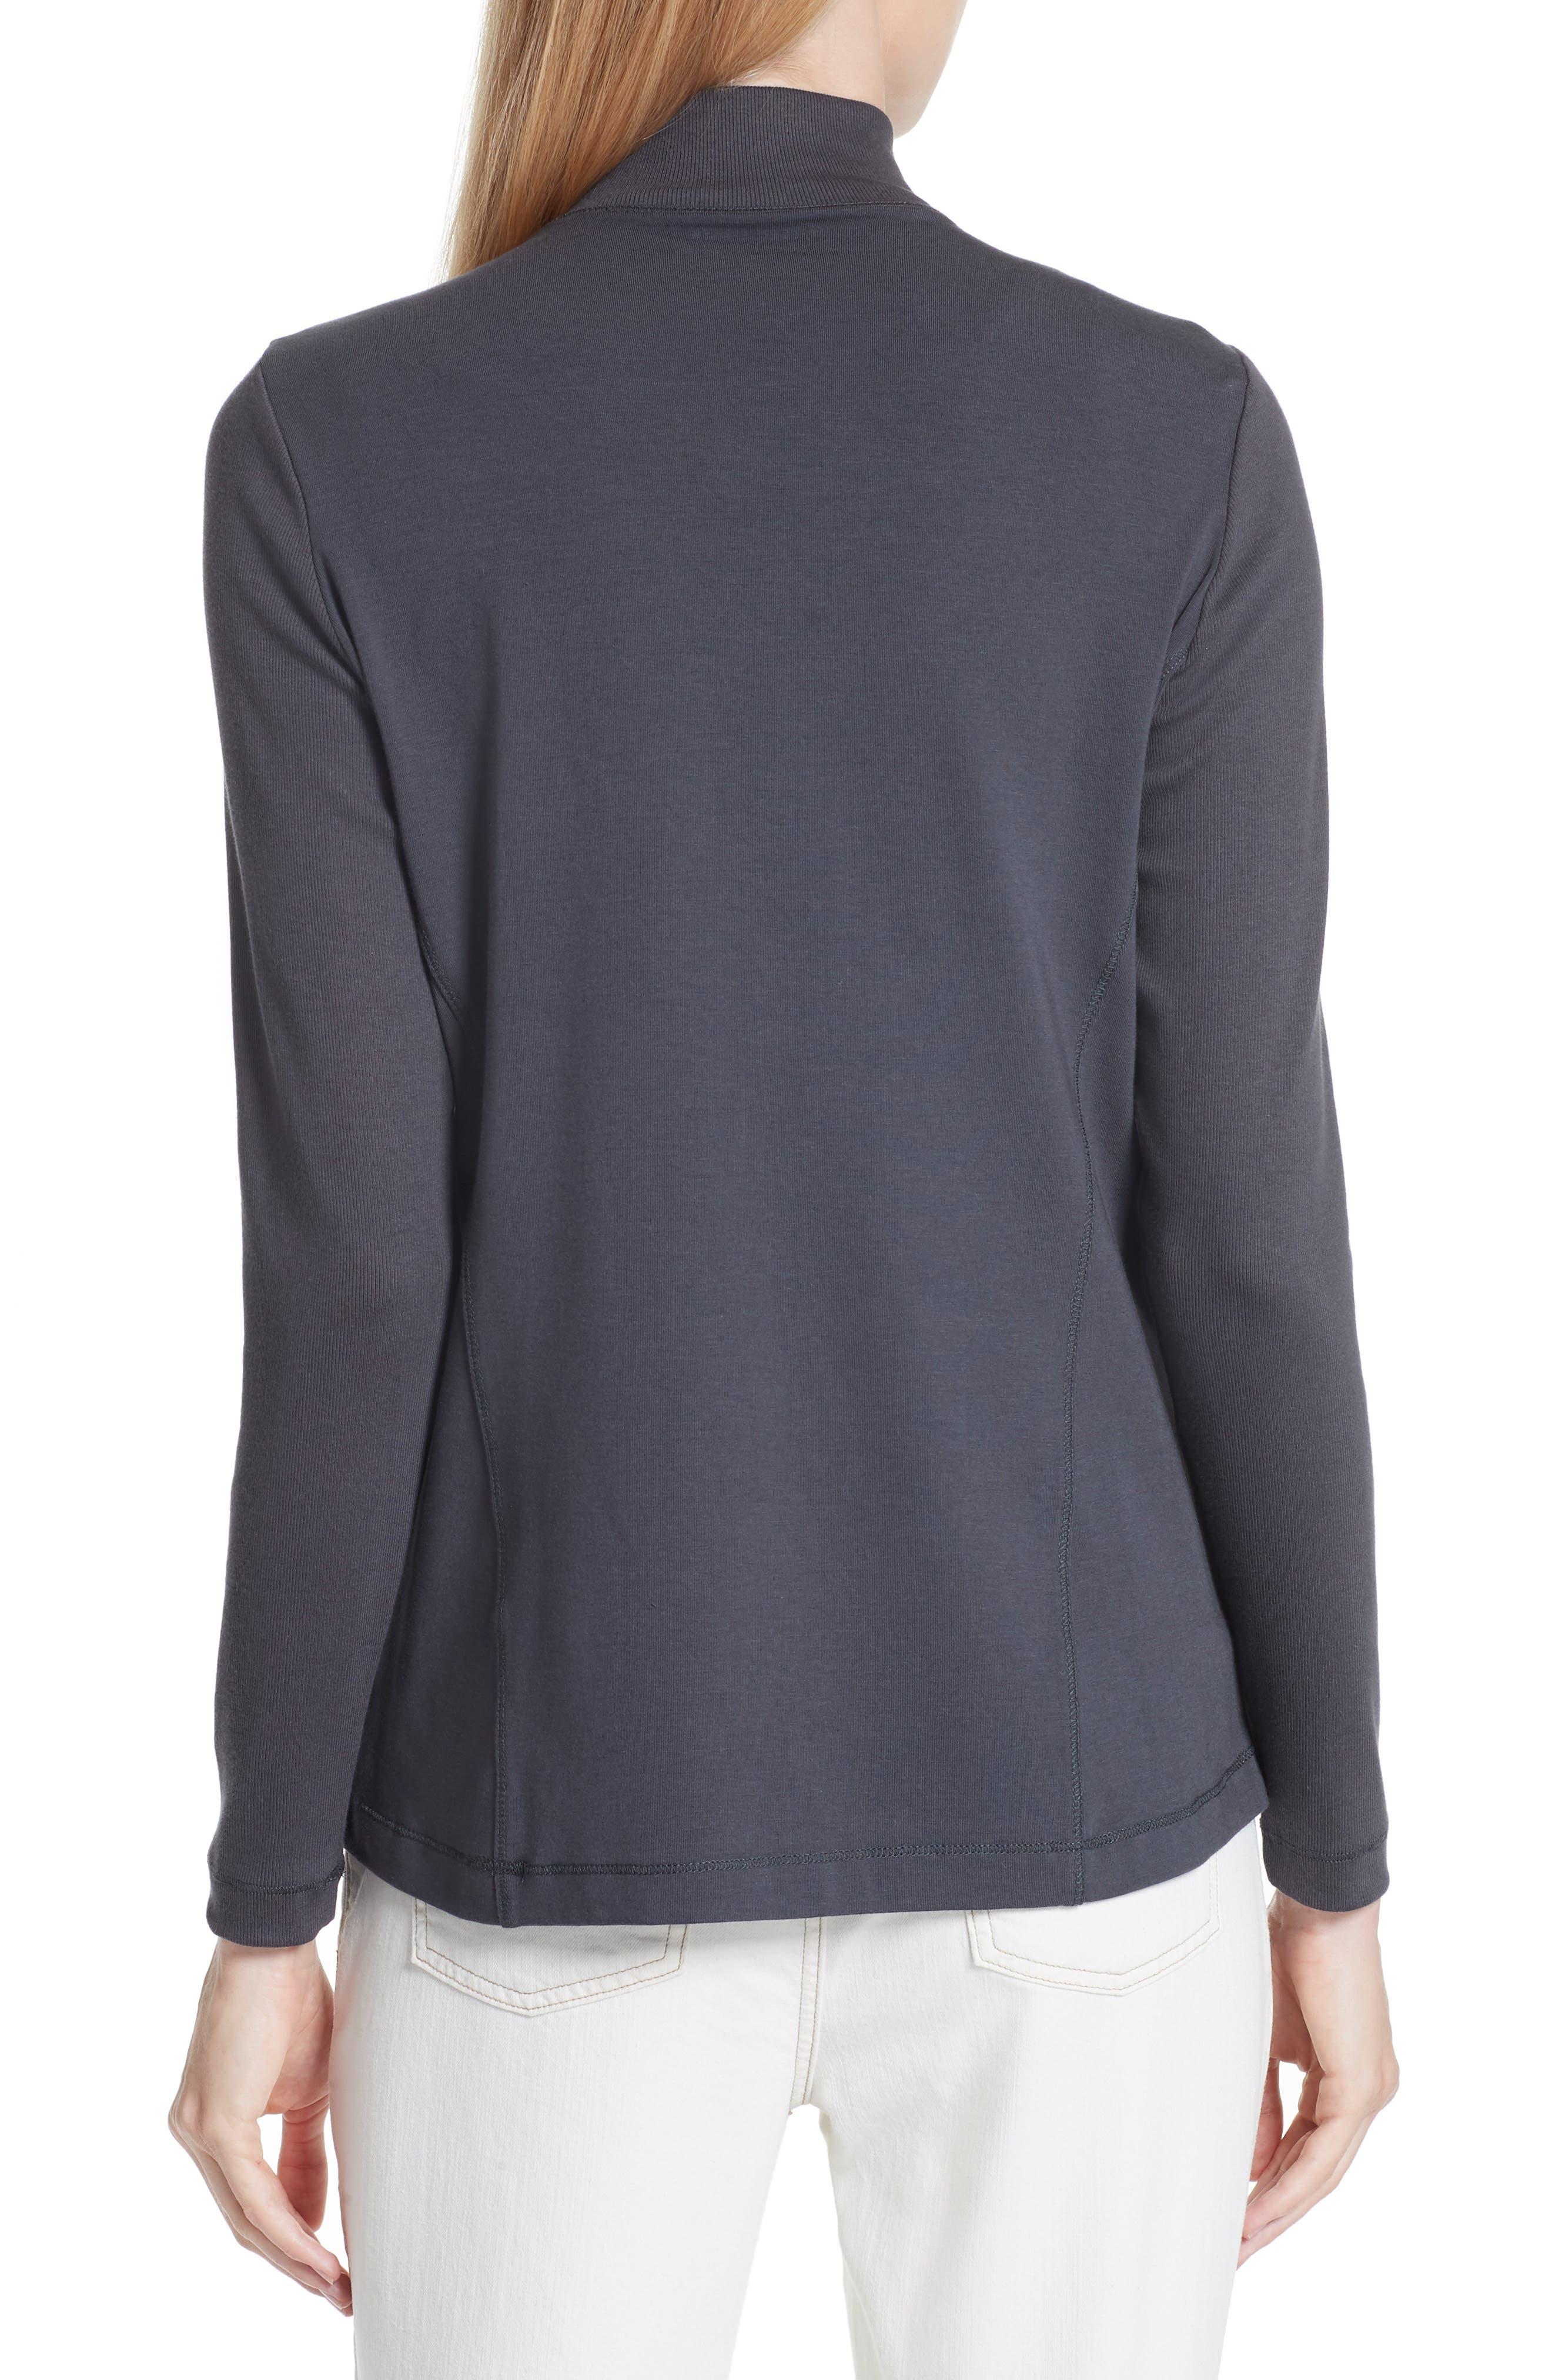 Mixed Organic Cotton Stretch Knit Jacket,                             Alternate thumbnail 2, color,                             025